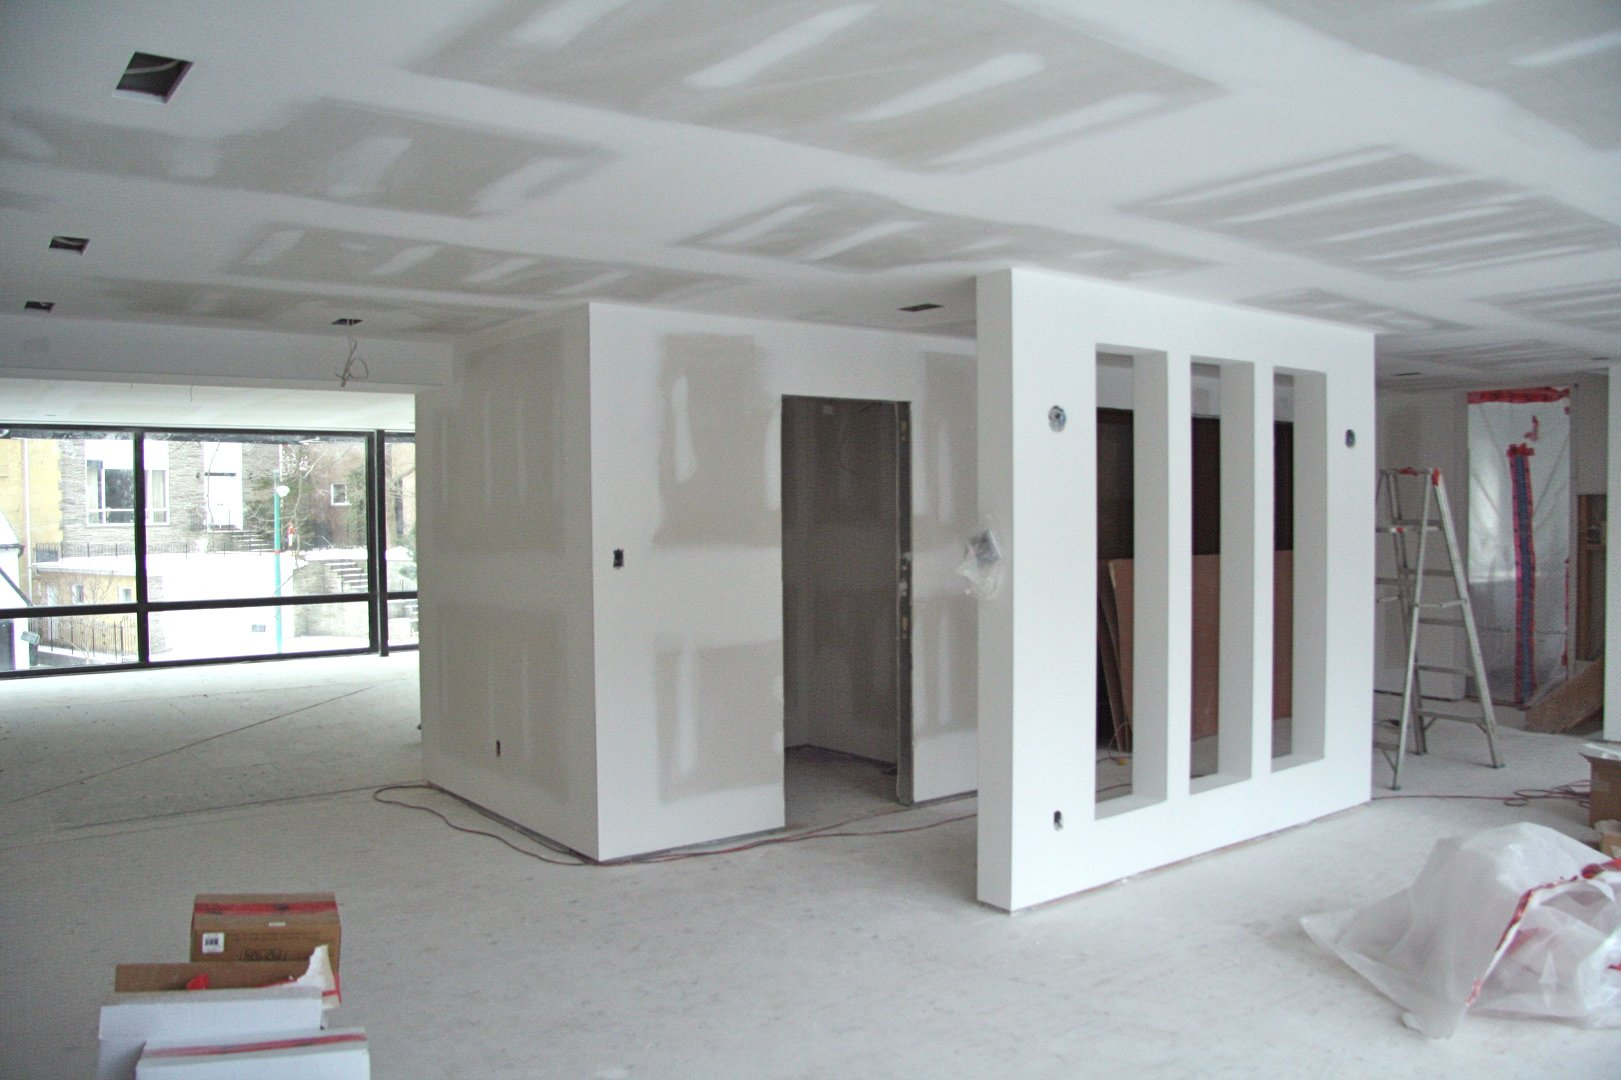 перегородка арка на кухню шириной 3 метра фото схема